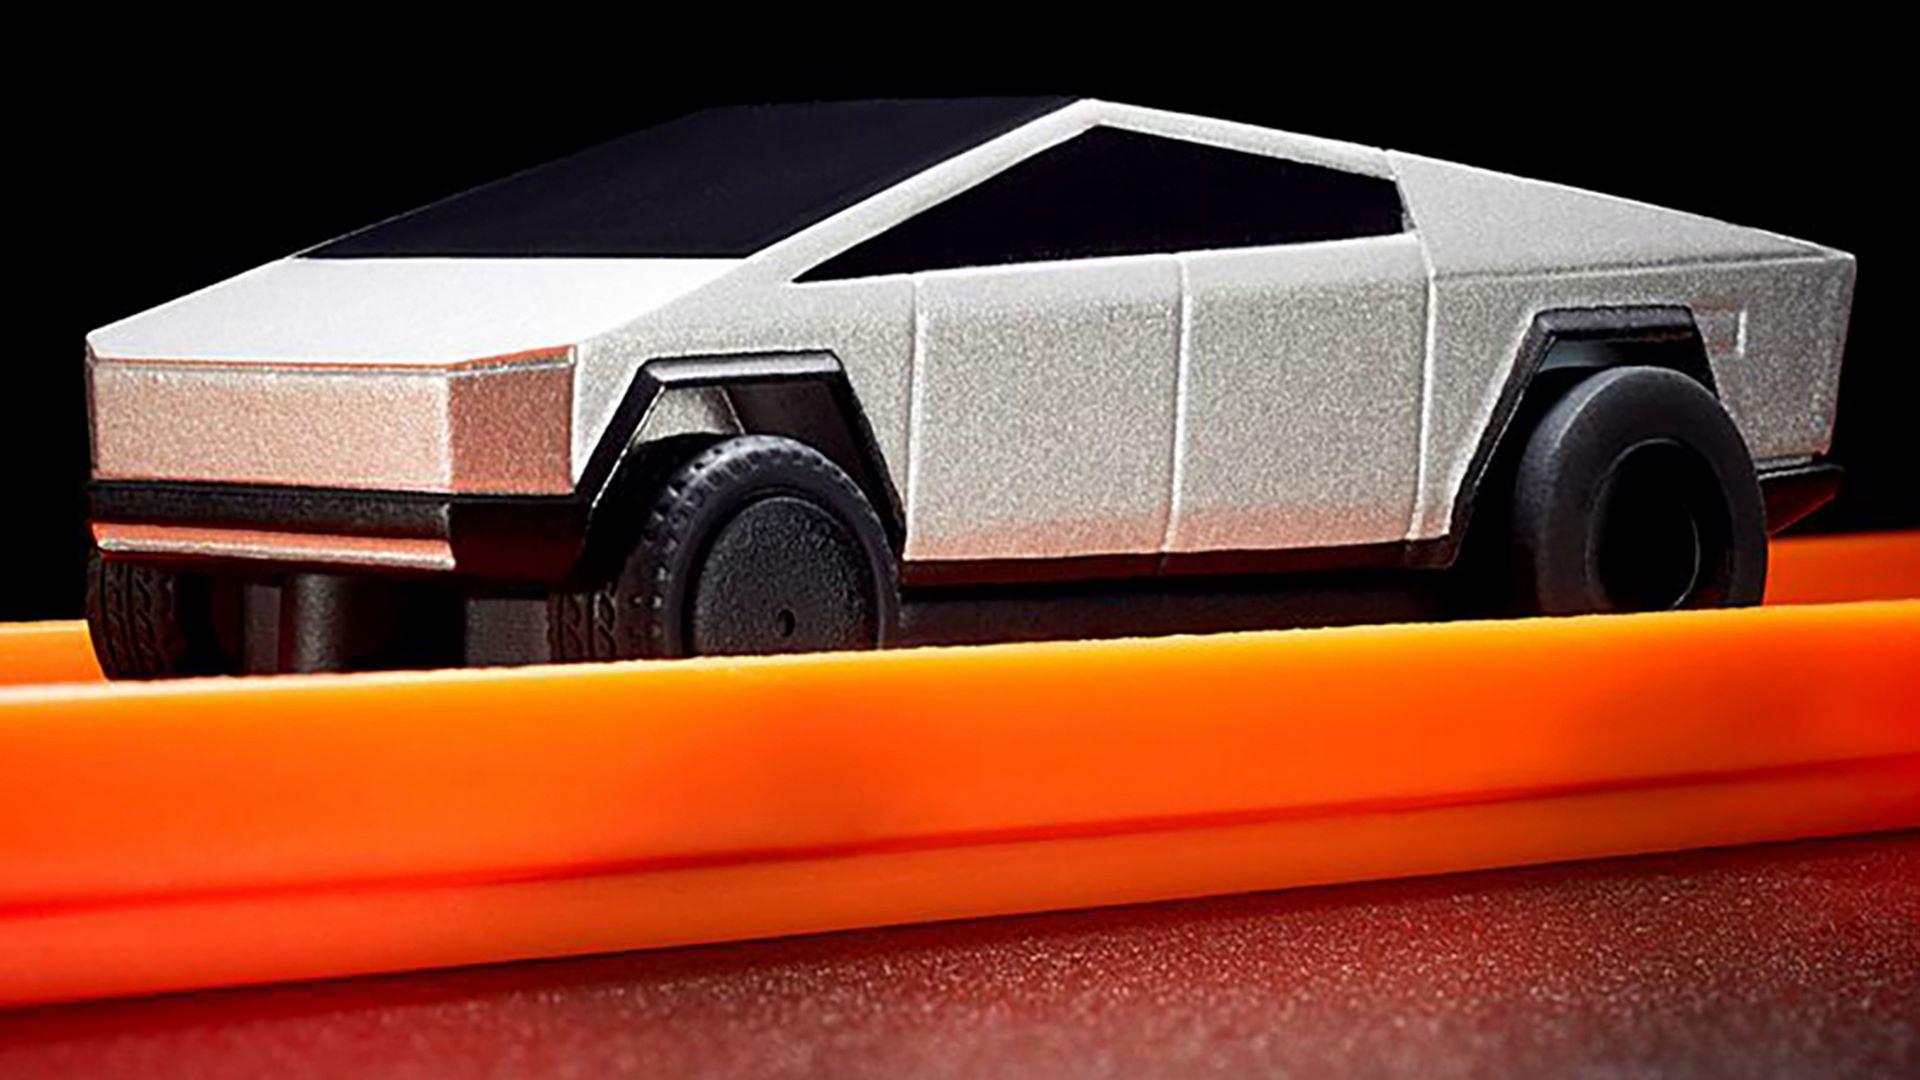 Hot-Wheels-RC-Tesla-Cybertruck-10